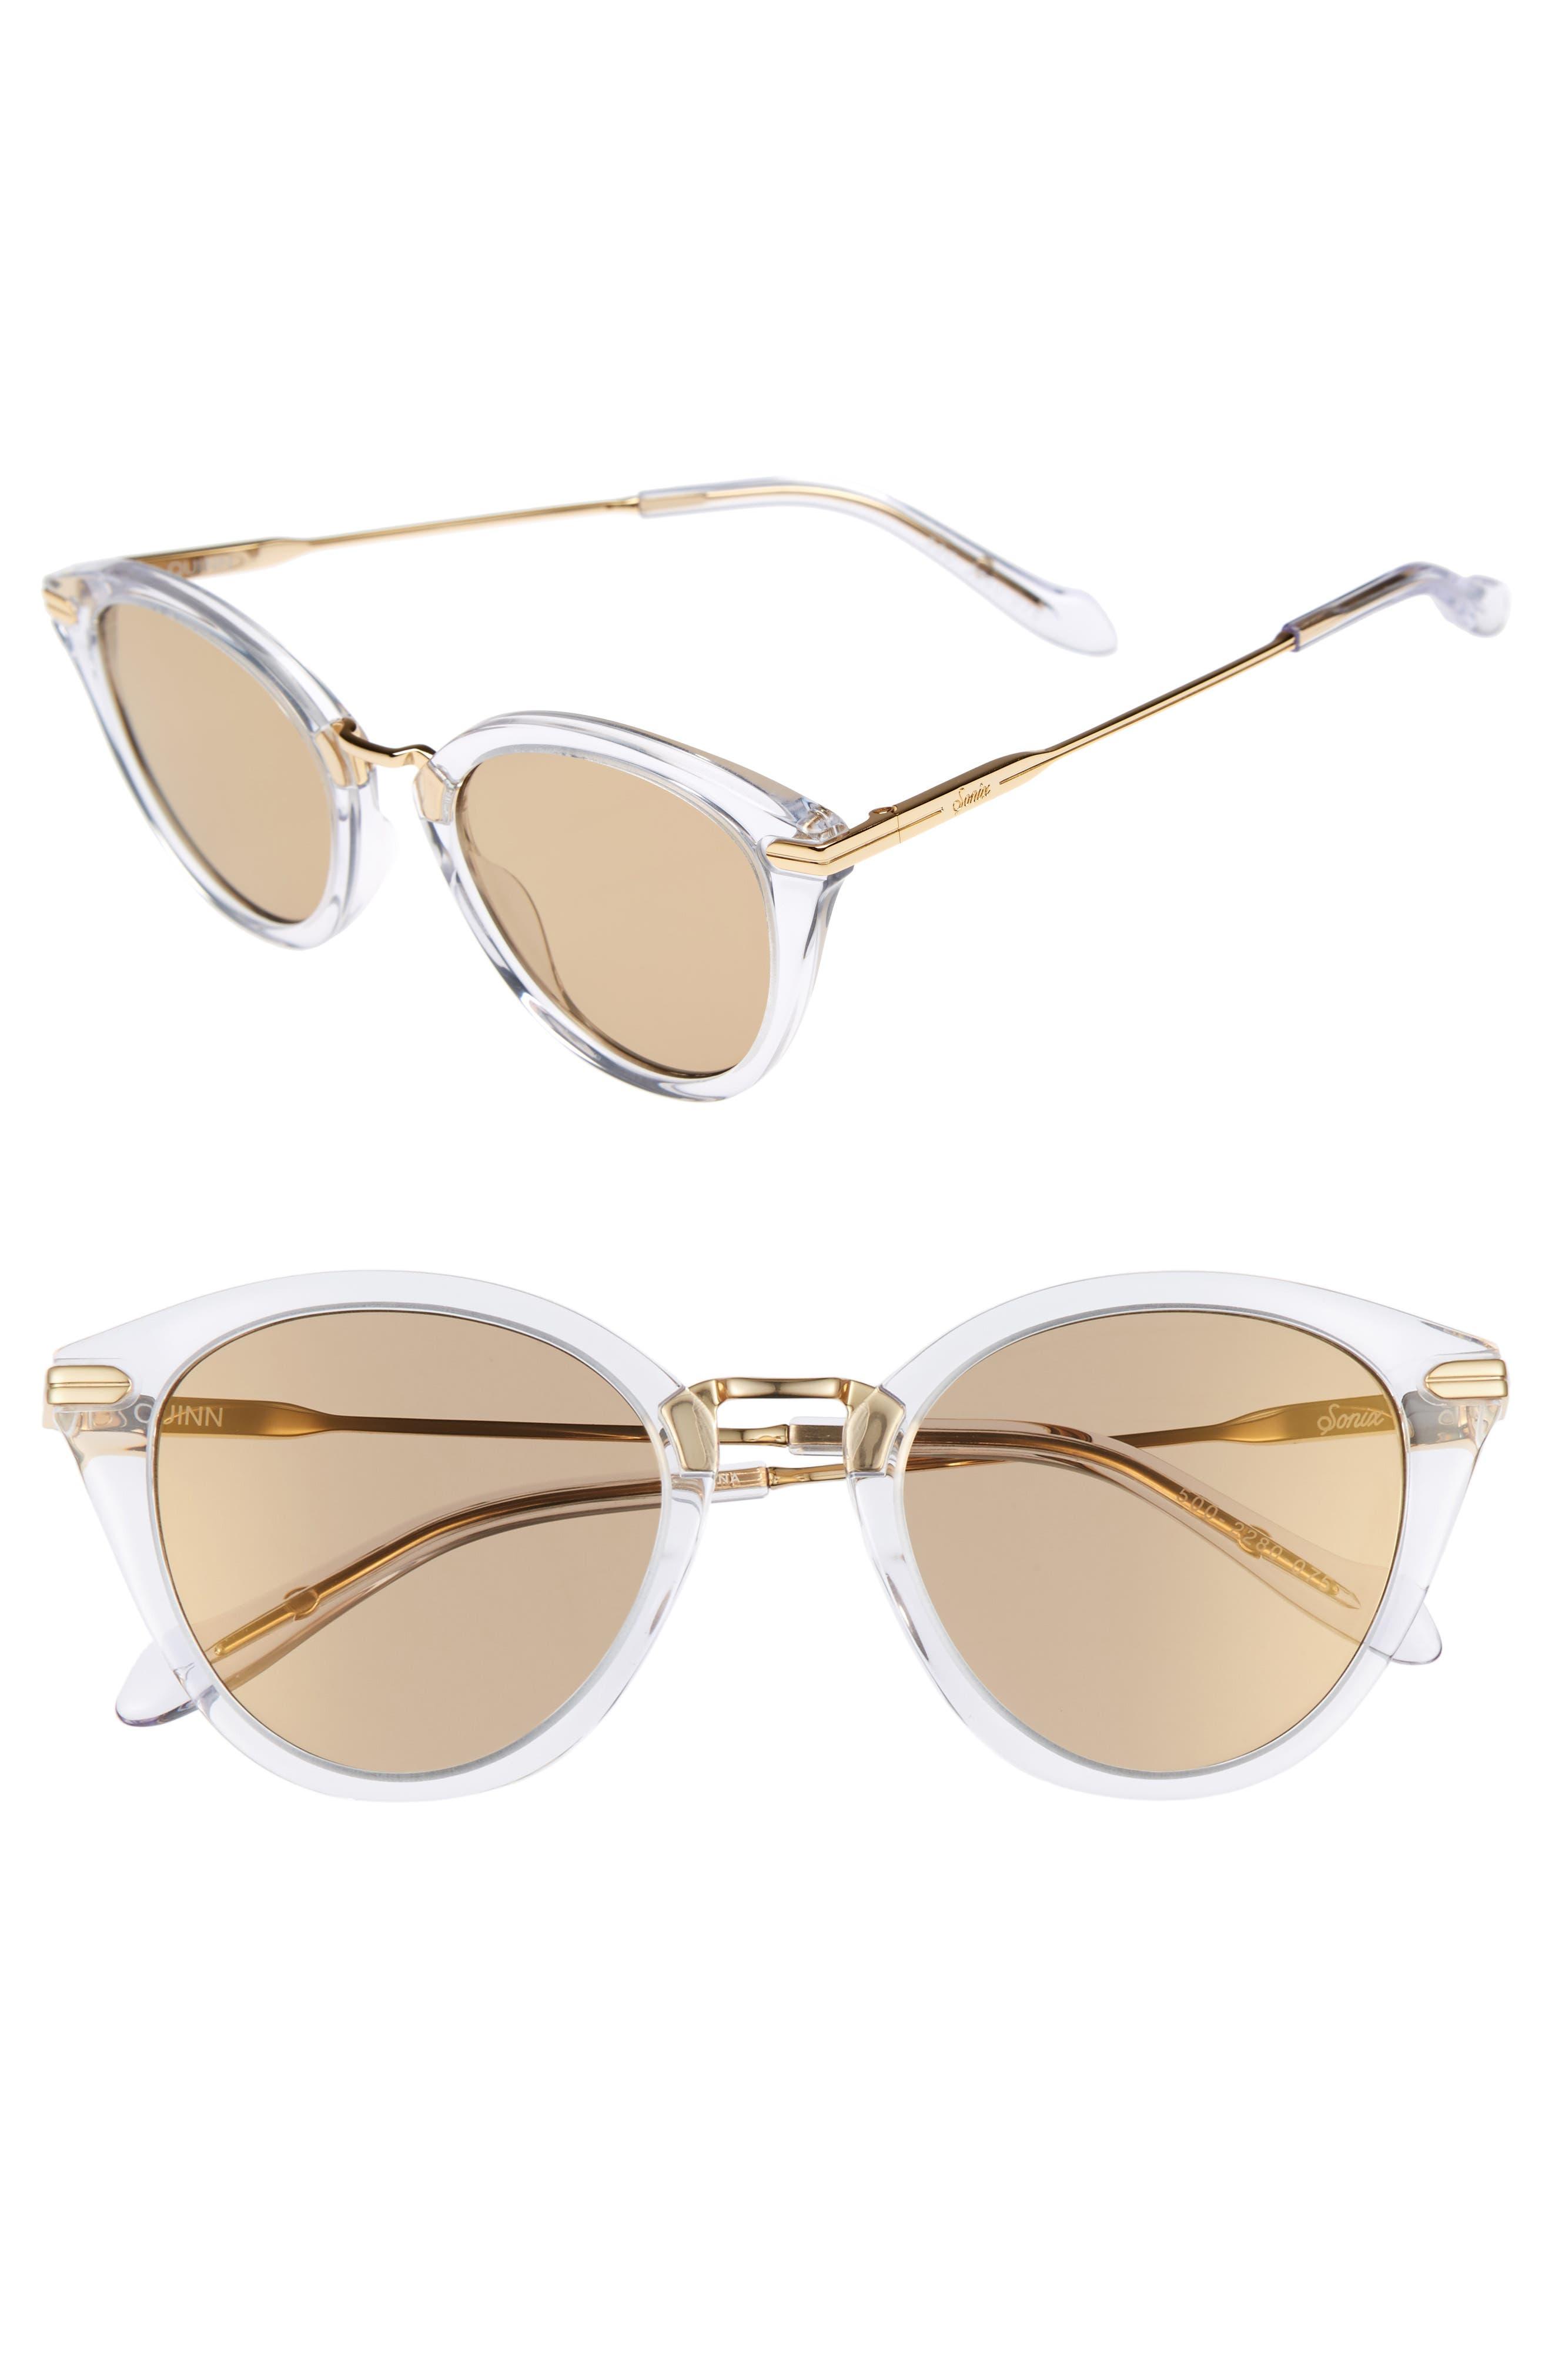 Quinn 48mm Cat Eye Sunglasses,                             Main thumbnail 1, color,                             Clear/ Amber Mirror